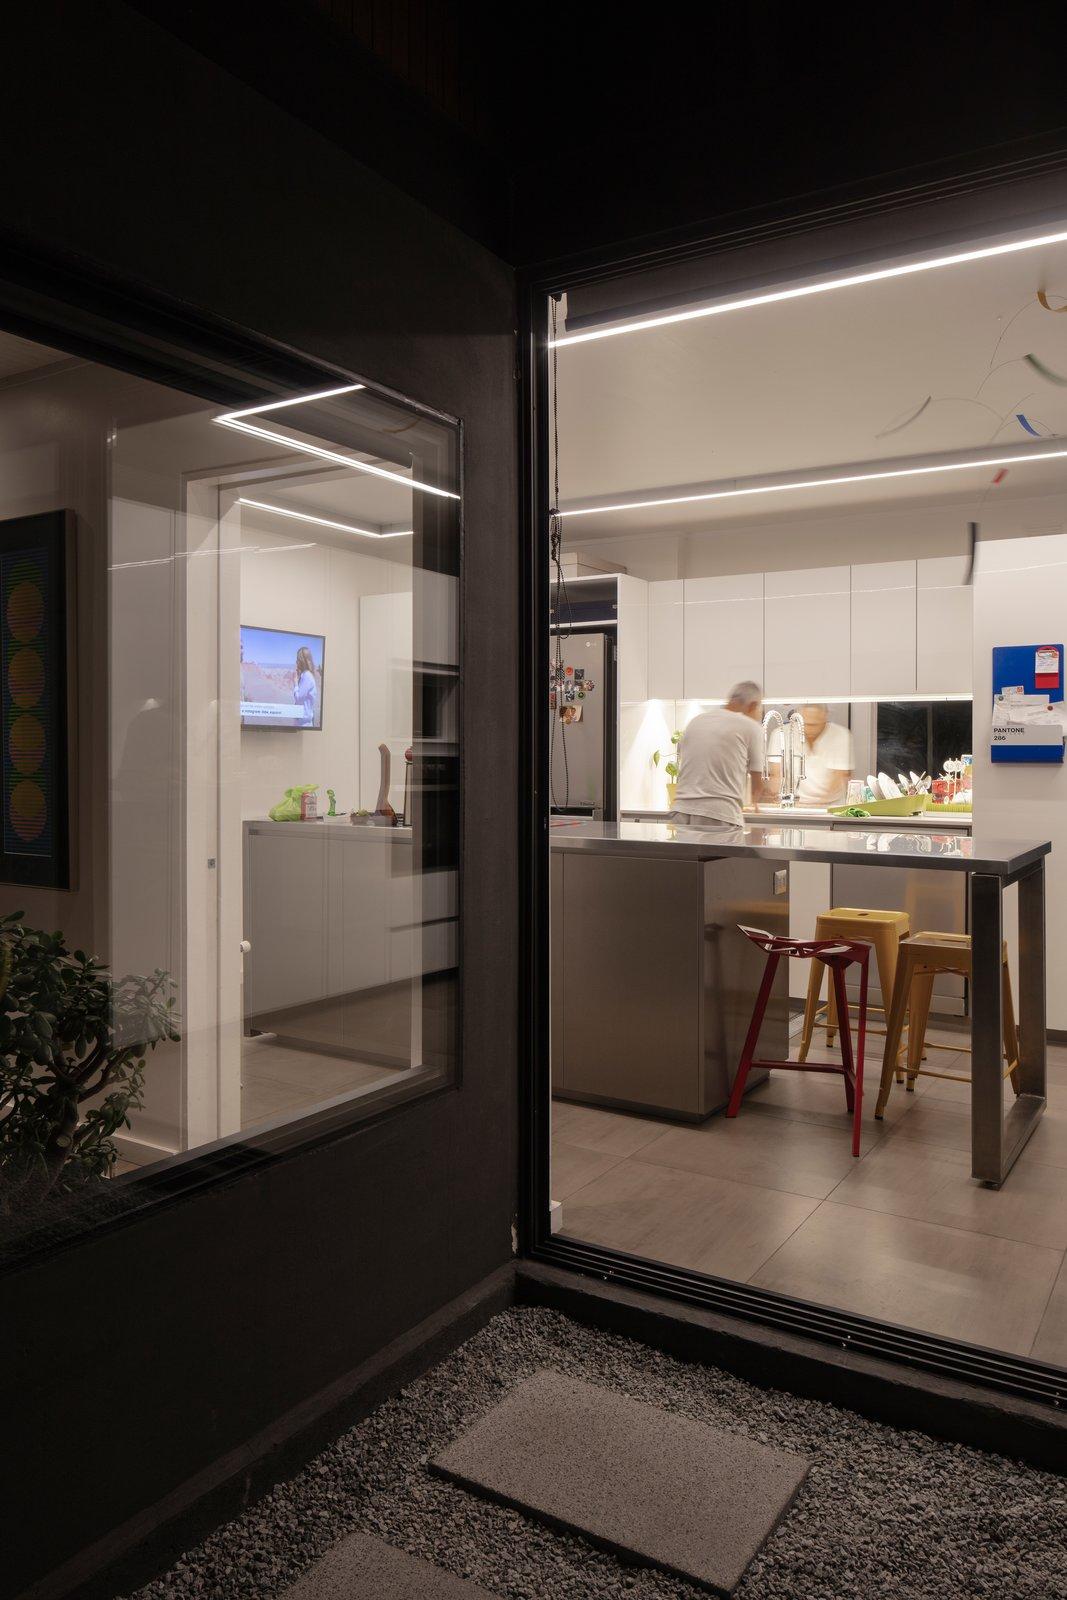 Kitchen, Refrigerator, Ceiling Lighting, White Cabinet, Metal Counter, Dishwasher, Ceramic Tile Floor, and Mirror Backsplashe  Virginia House